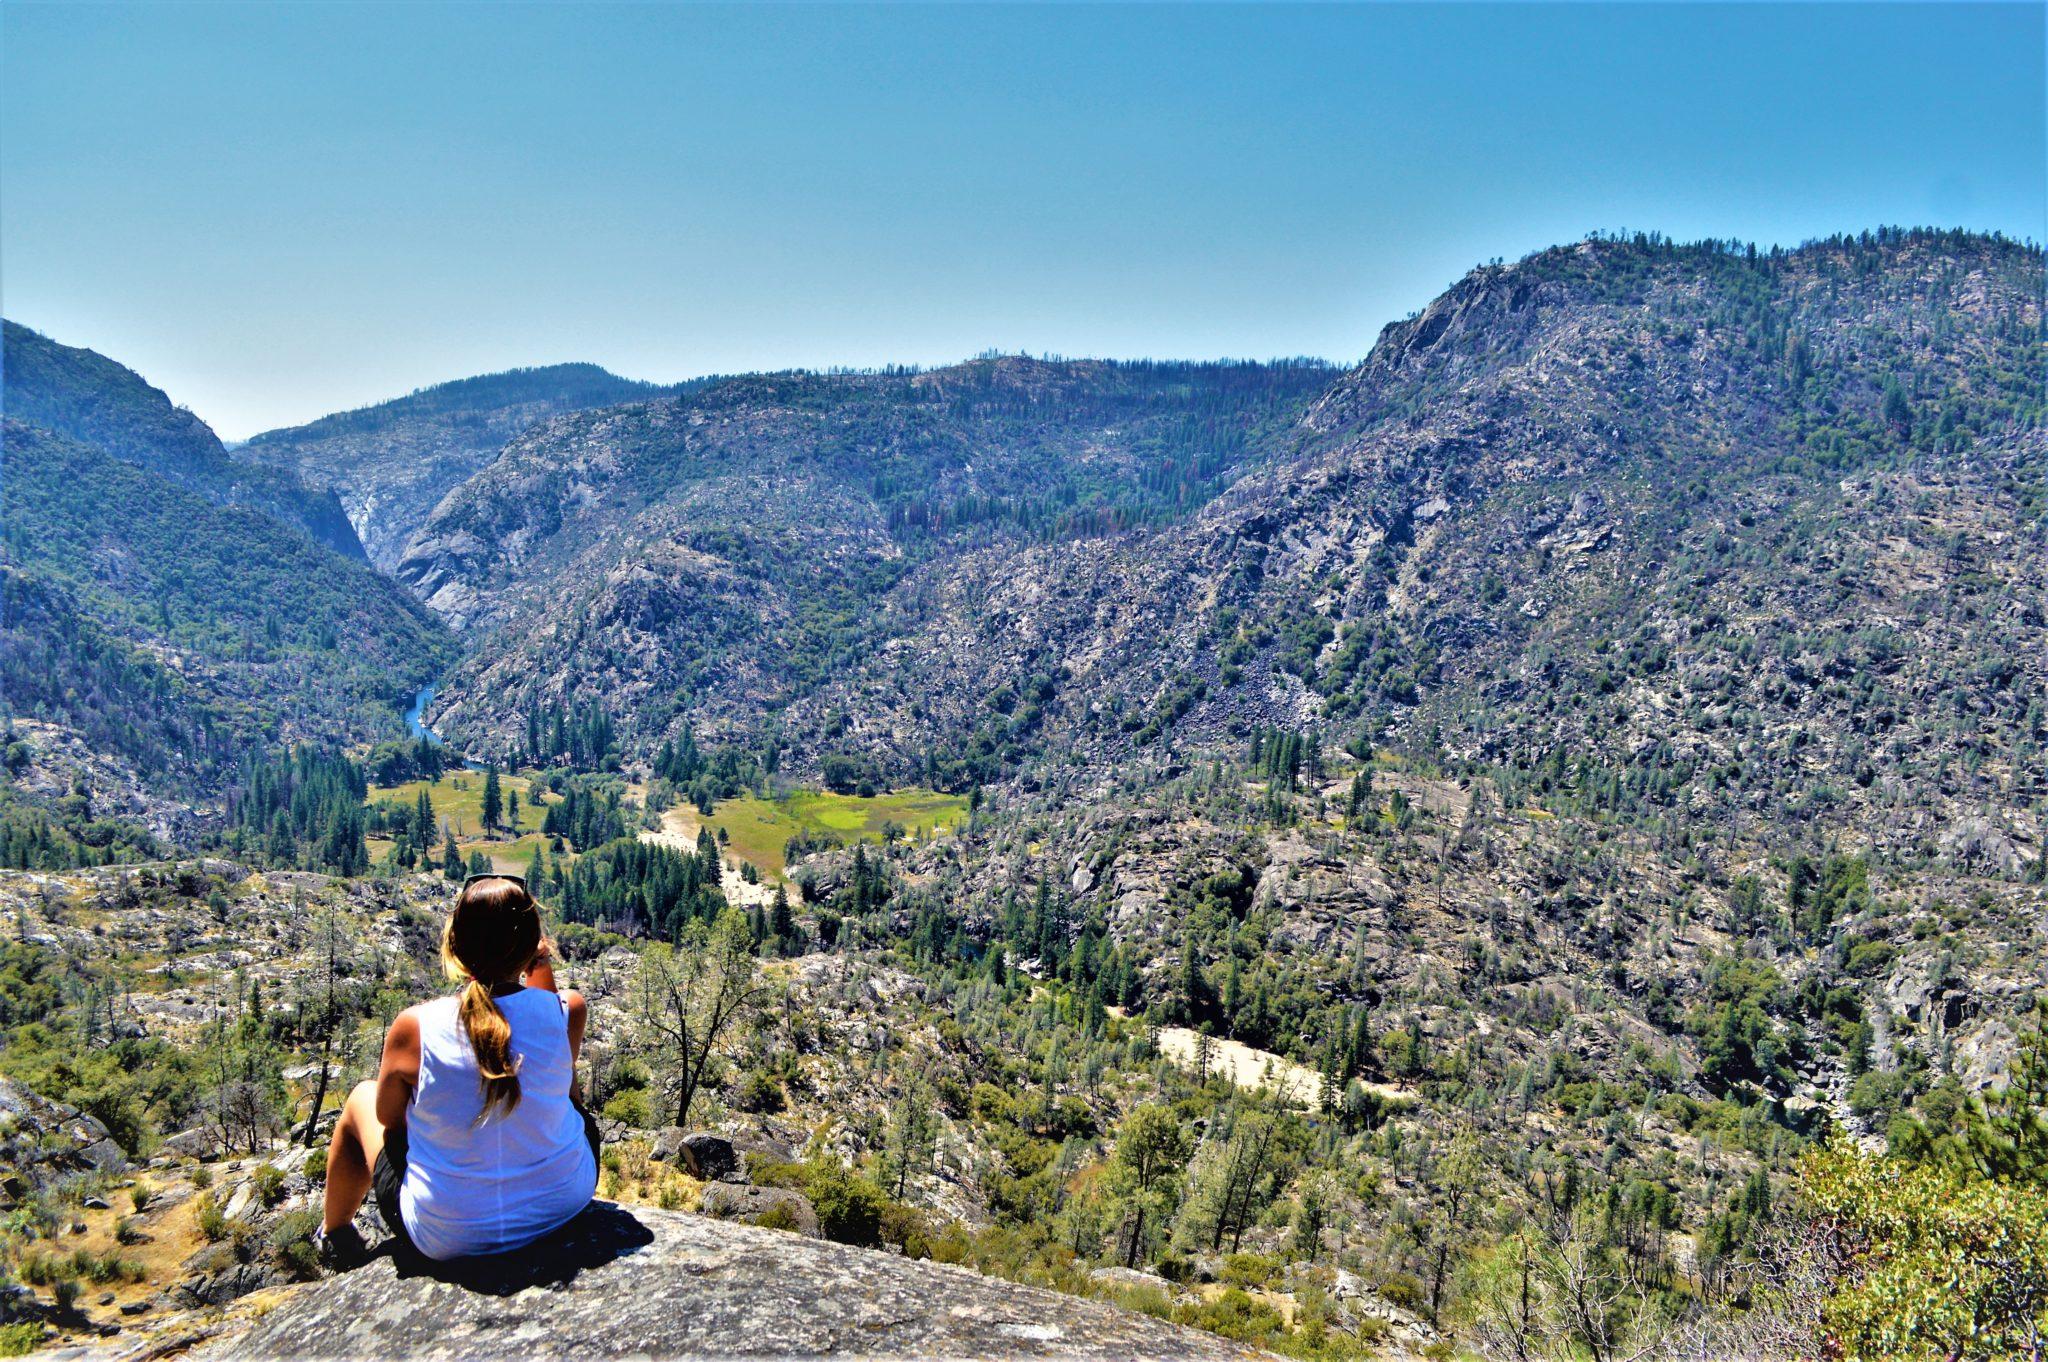 View at Hetch Hetchy, California